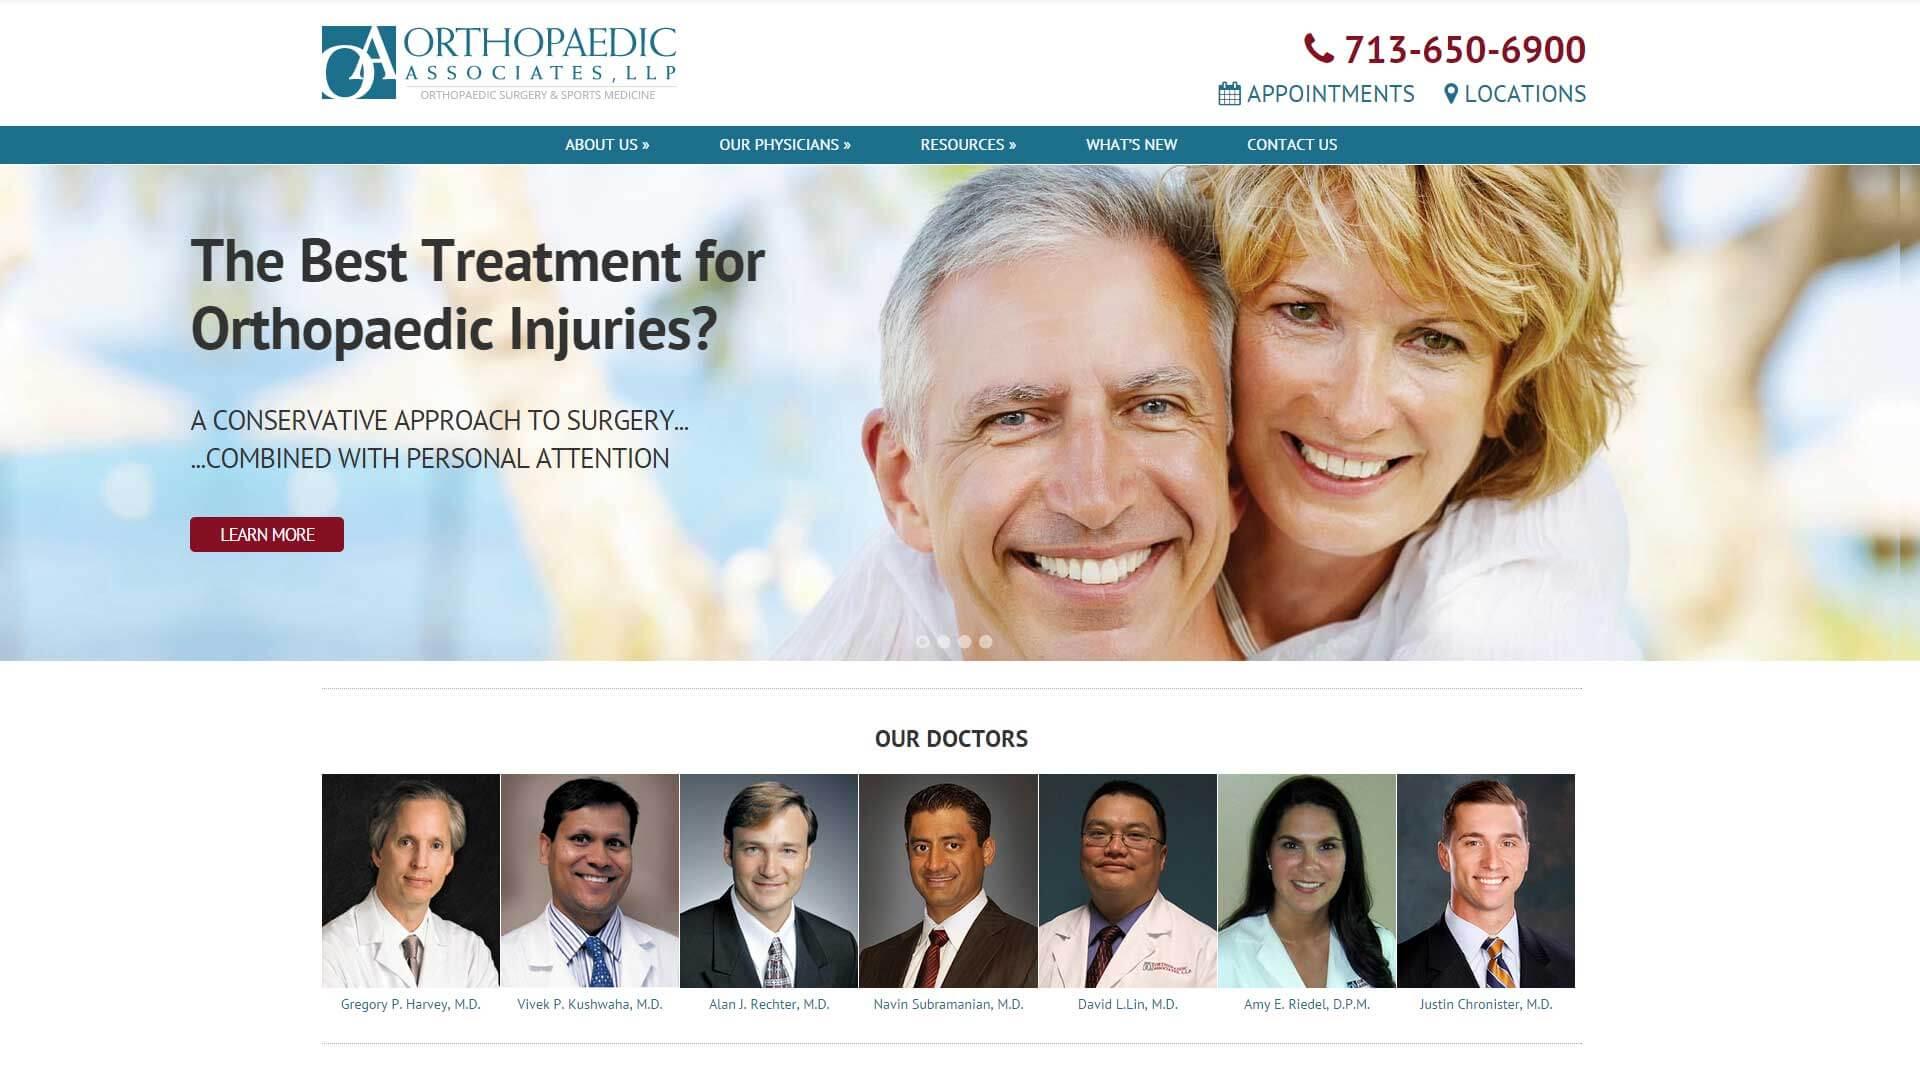 Orthopaedic Associates